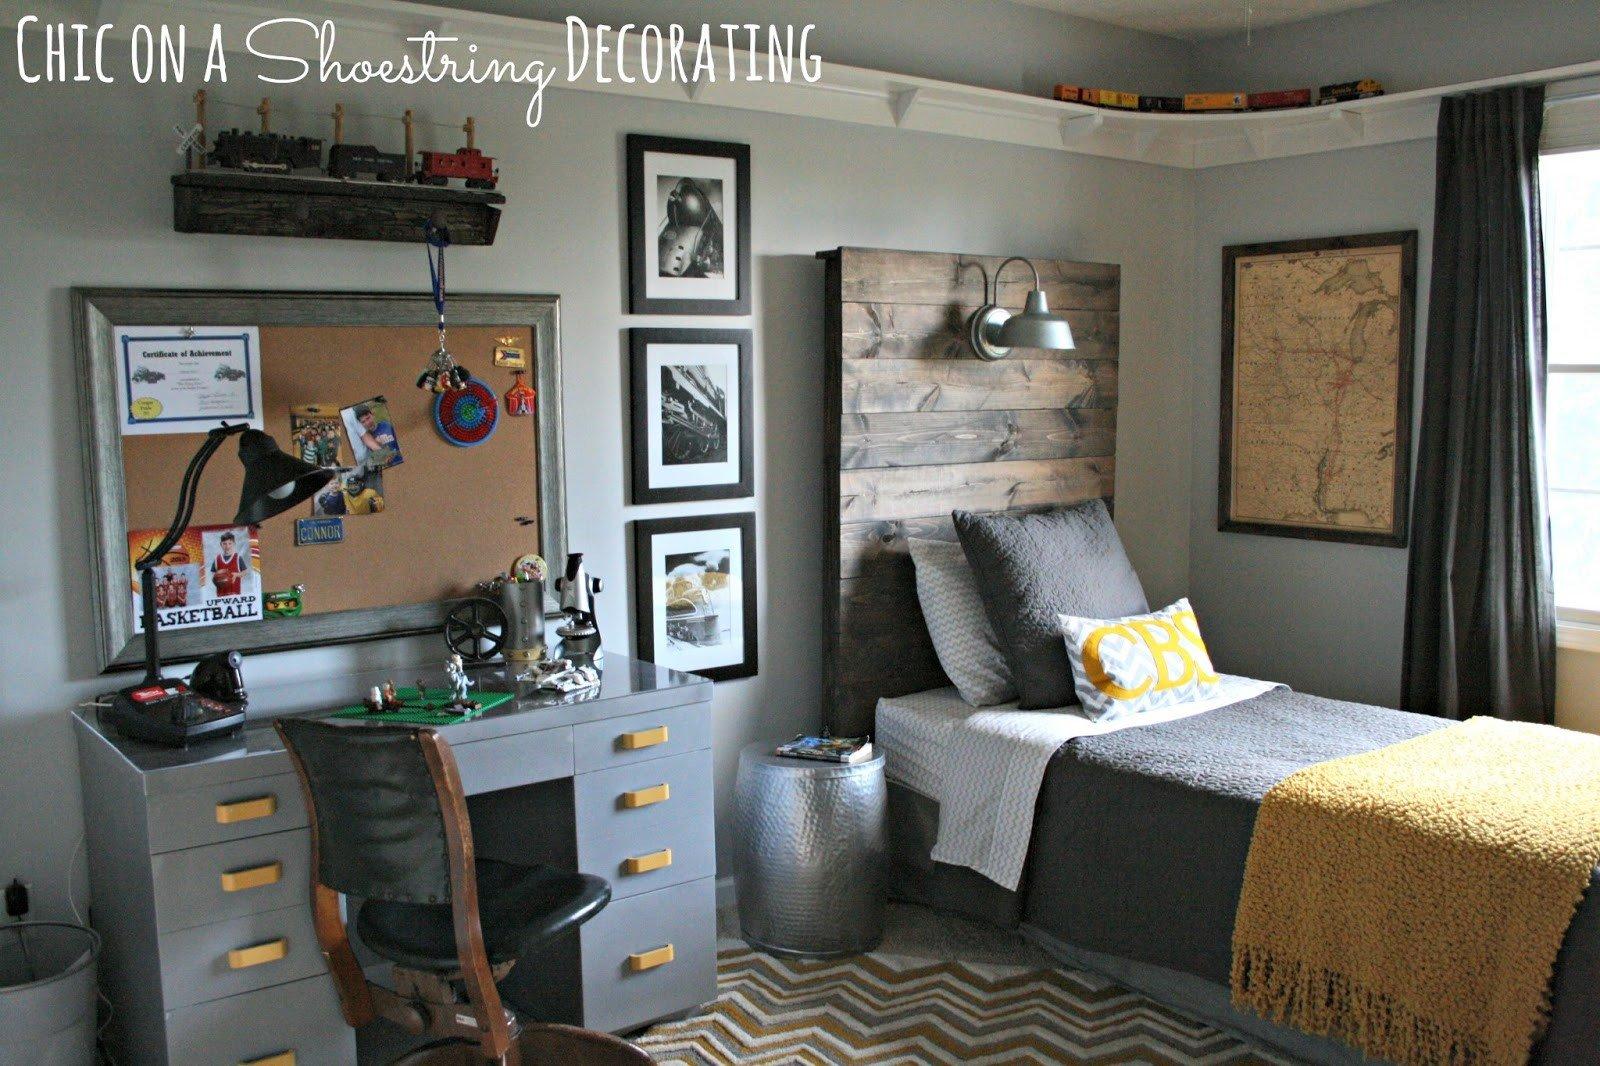 Room Decor Ideas for Boys Elegant Chic On A Shoestring Decorating Bigger Boy Room Reveal